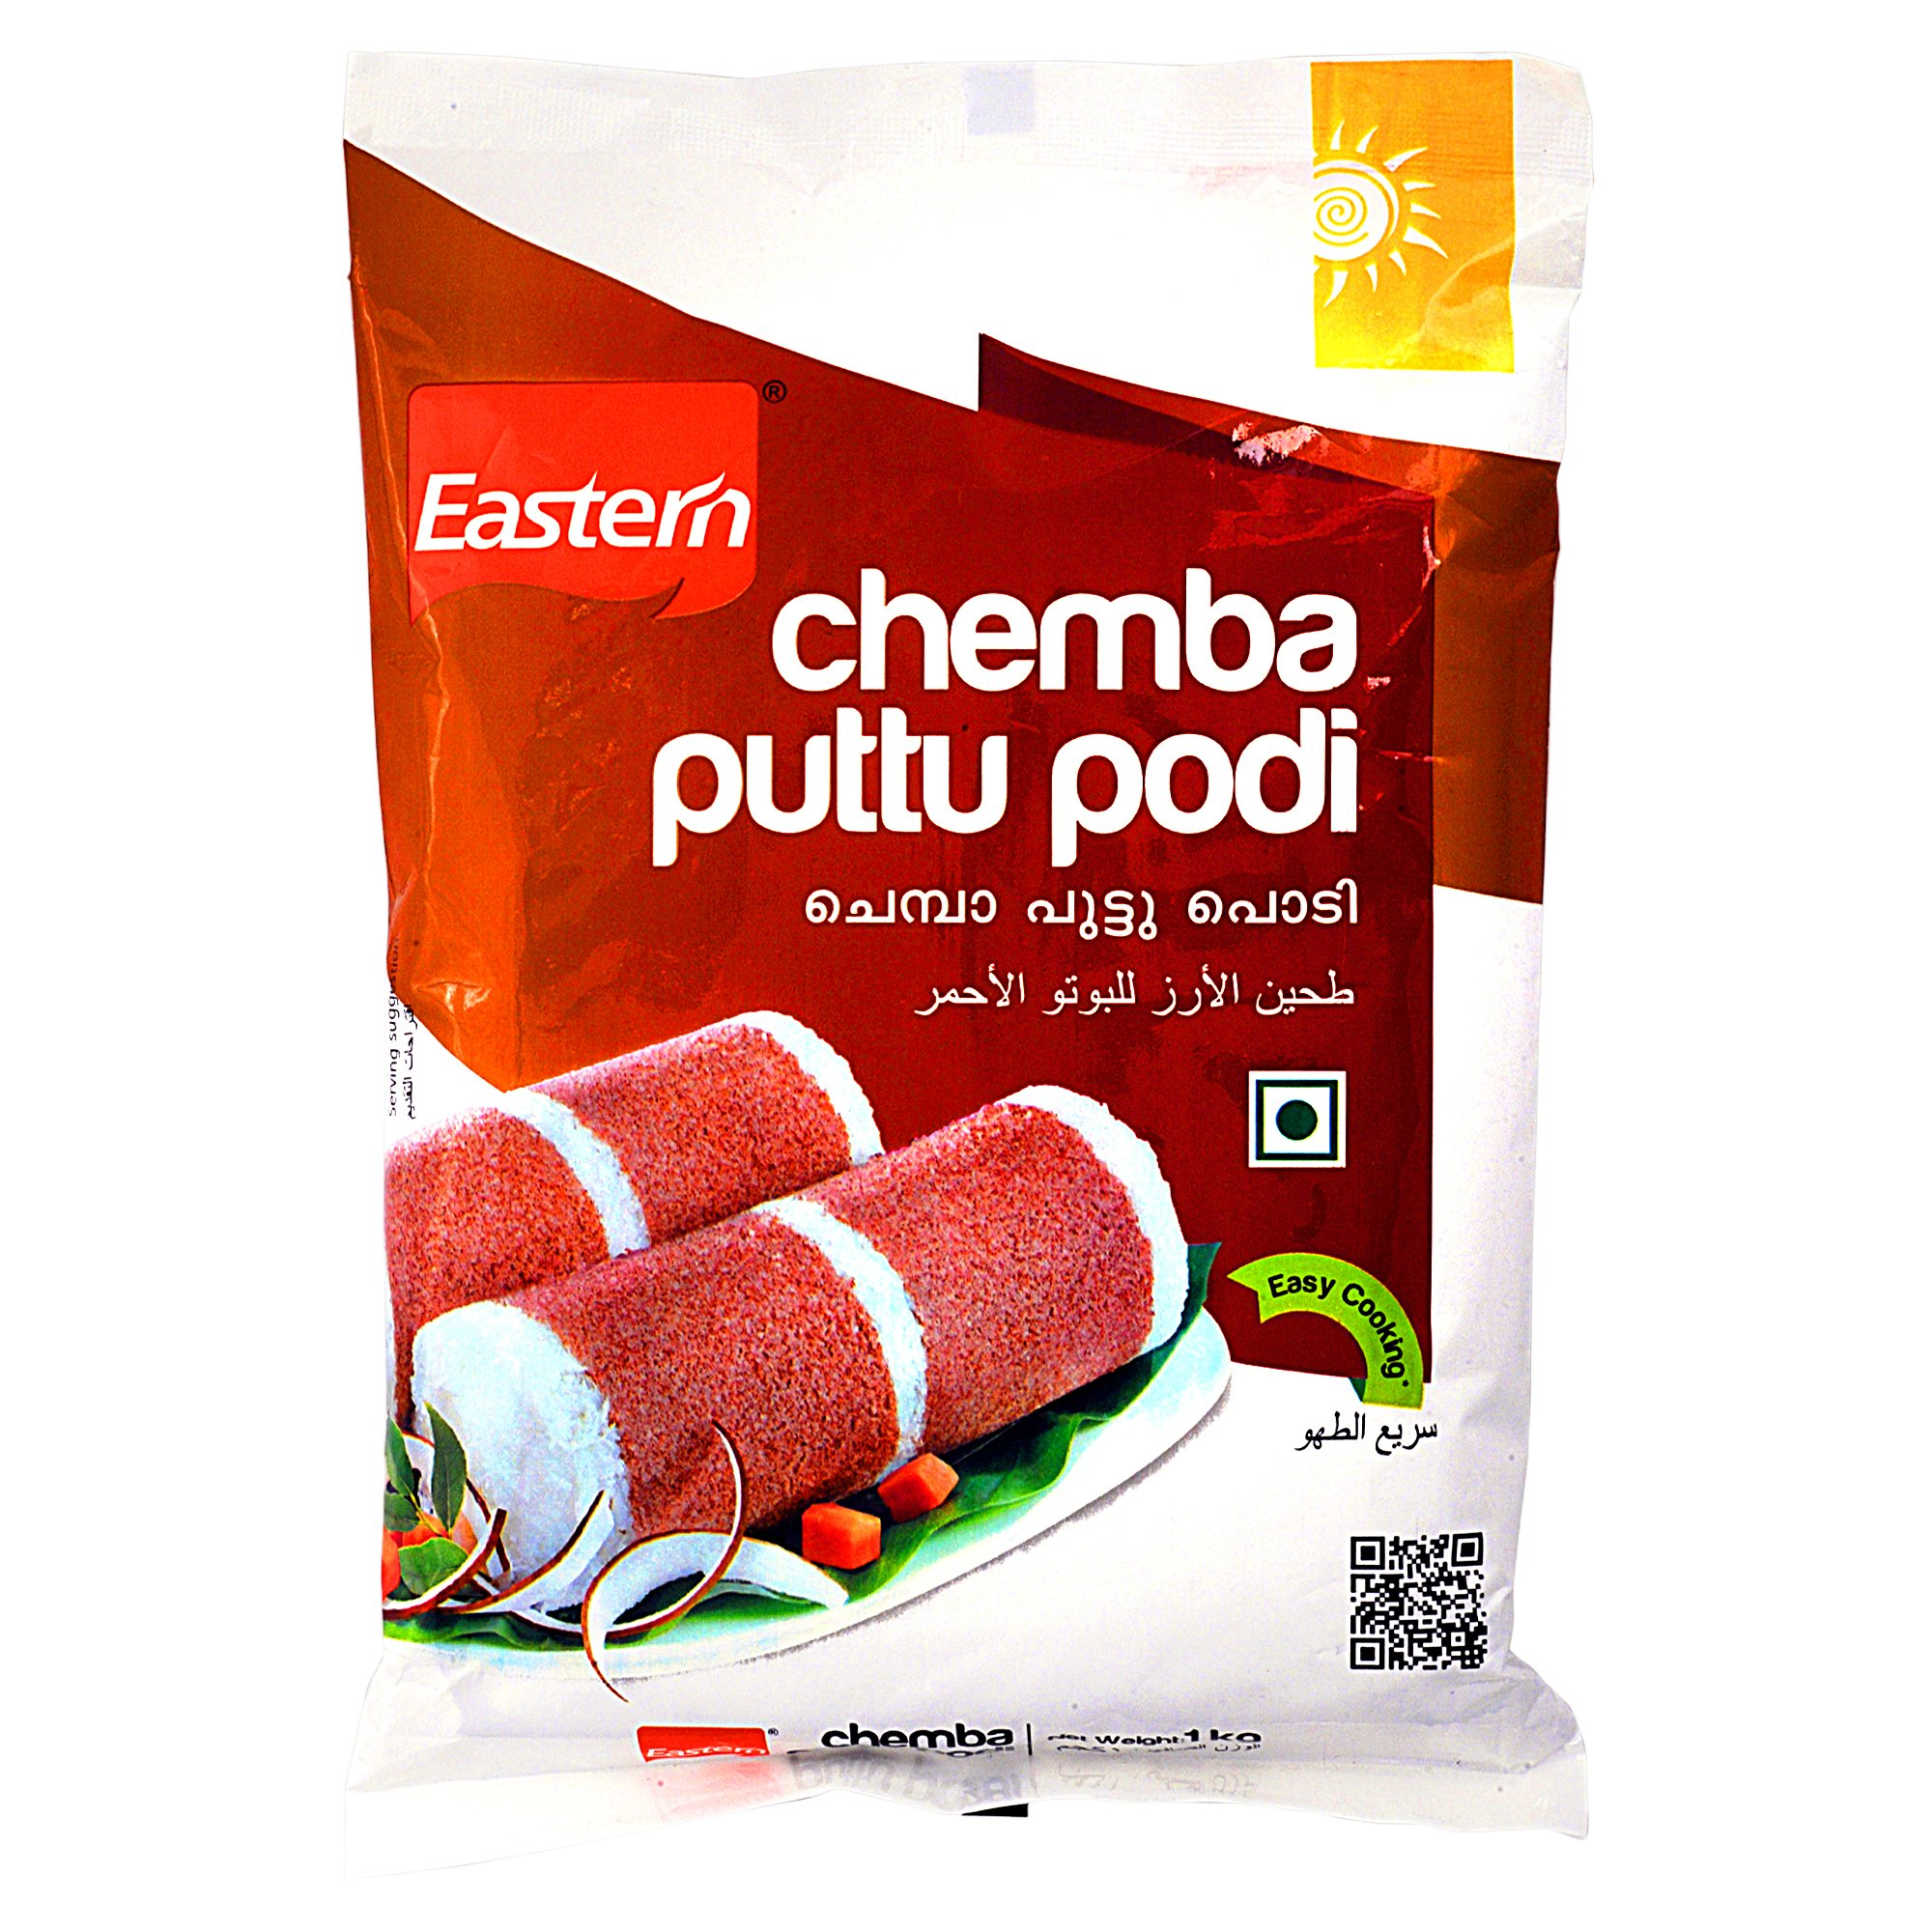 Eastern-Chemba-Puttu-Podi by Eastren